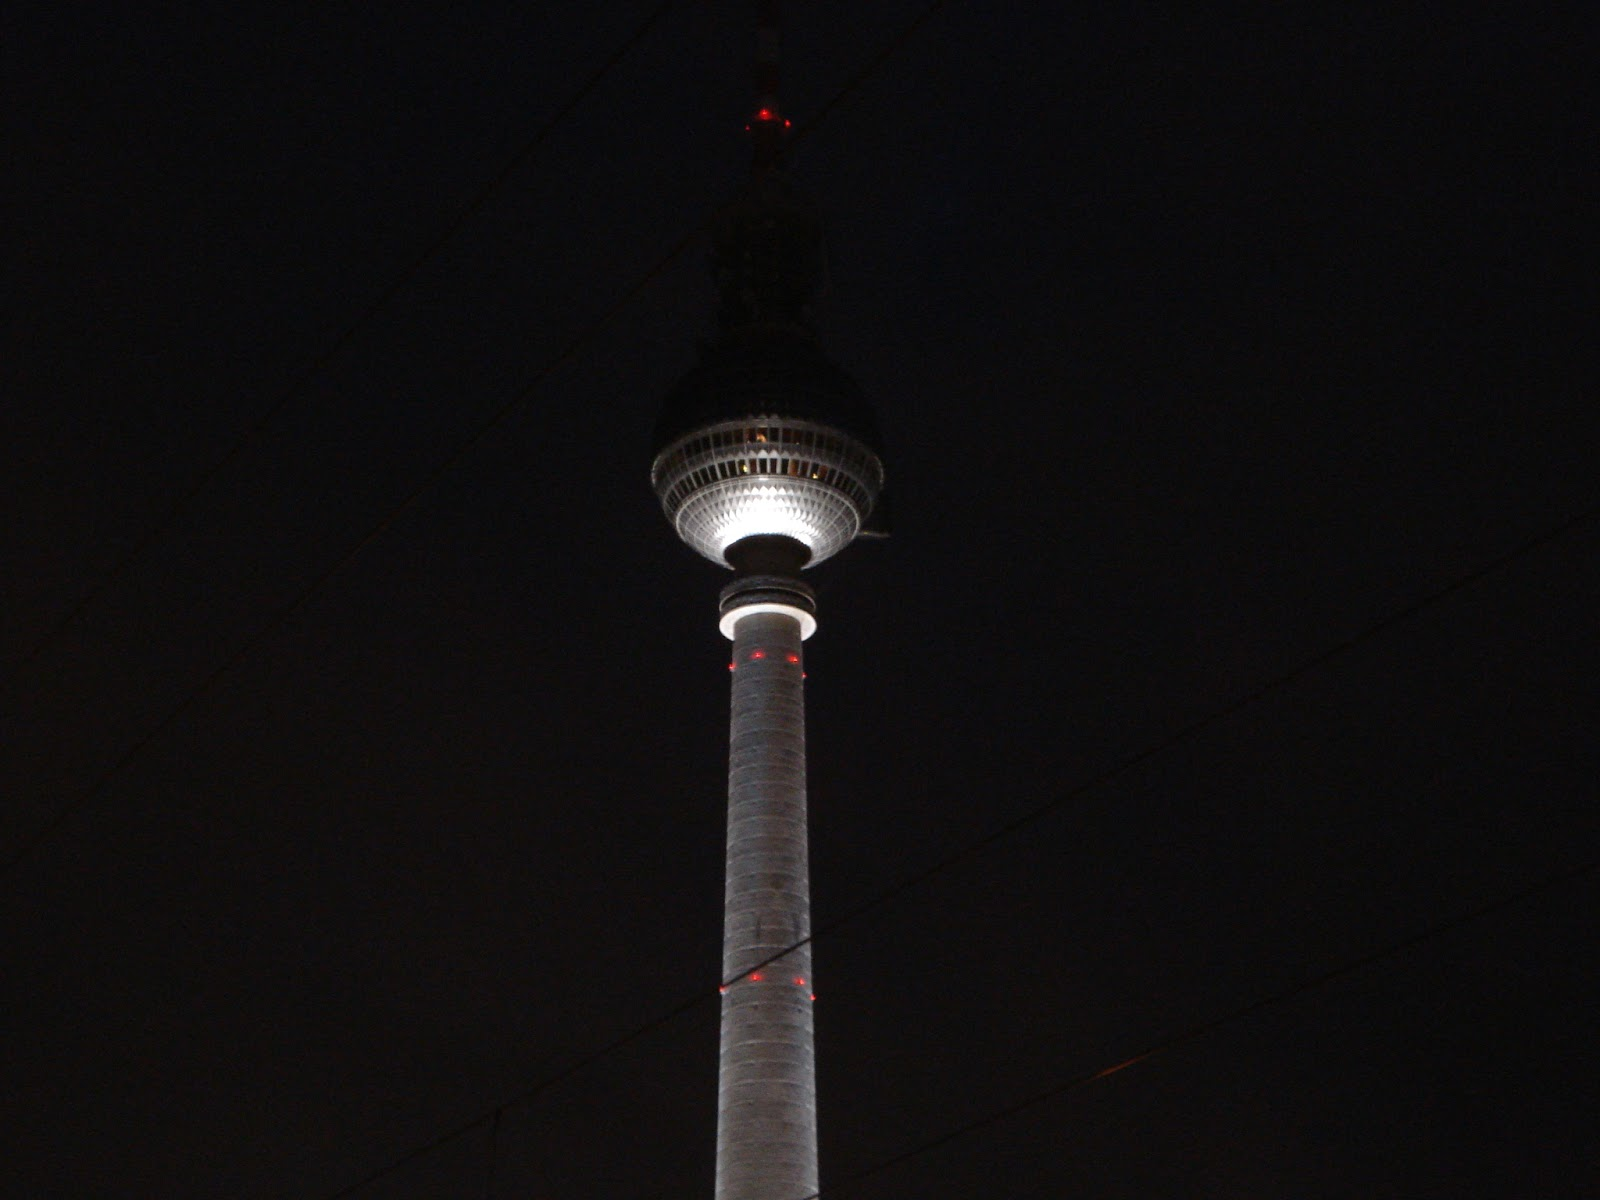 torre de comunicaciones de alexander platz, berlín